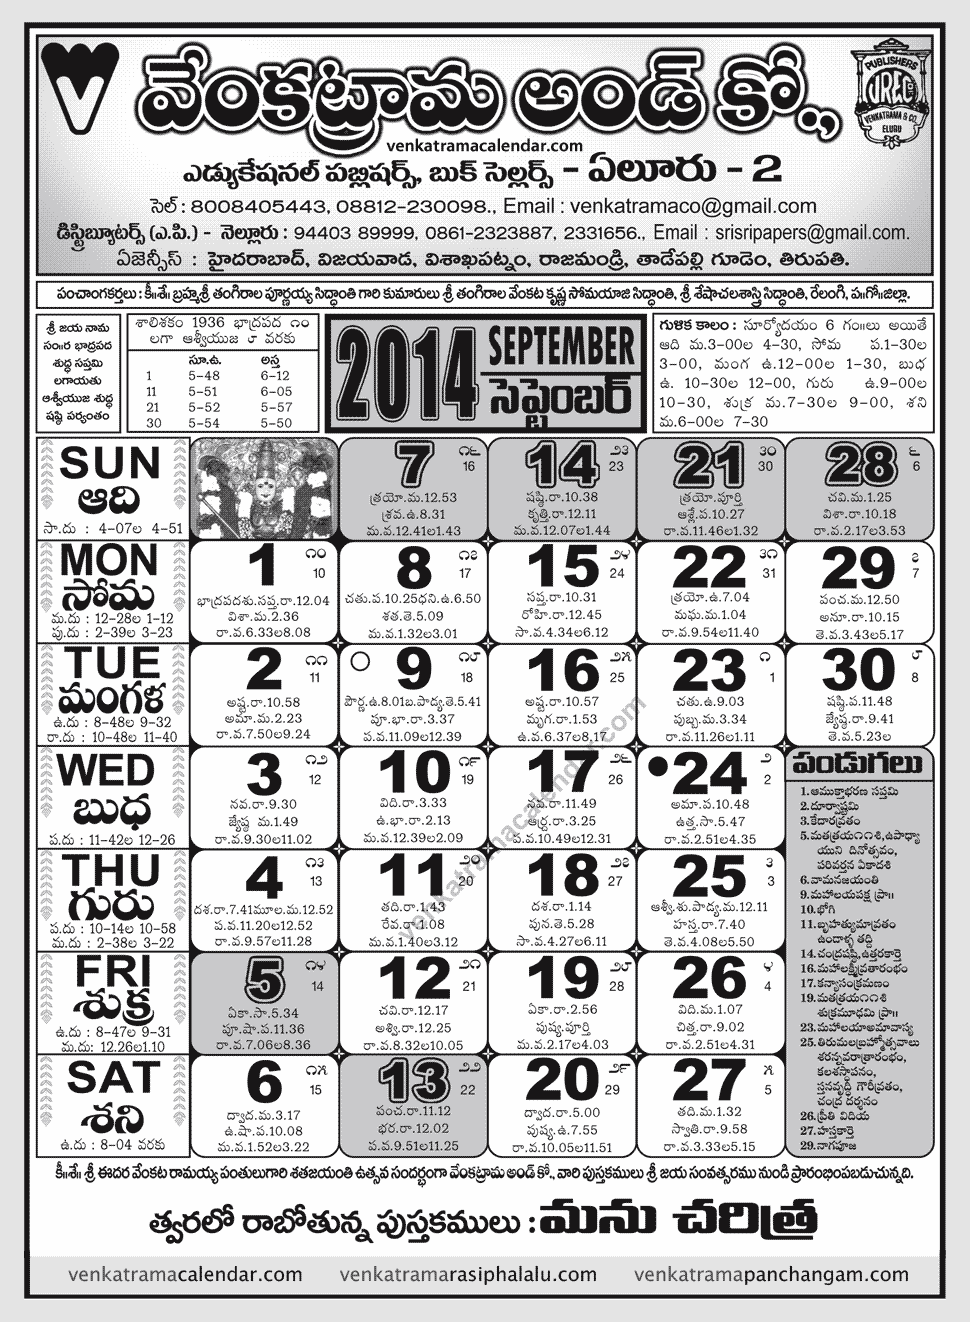 September 2014 Issue: Venkatrama & Co Calendar 2014: September 2014 Telugu Calendar